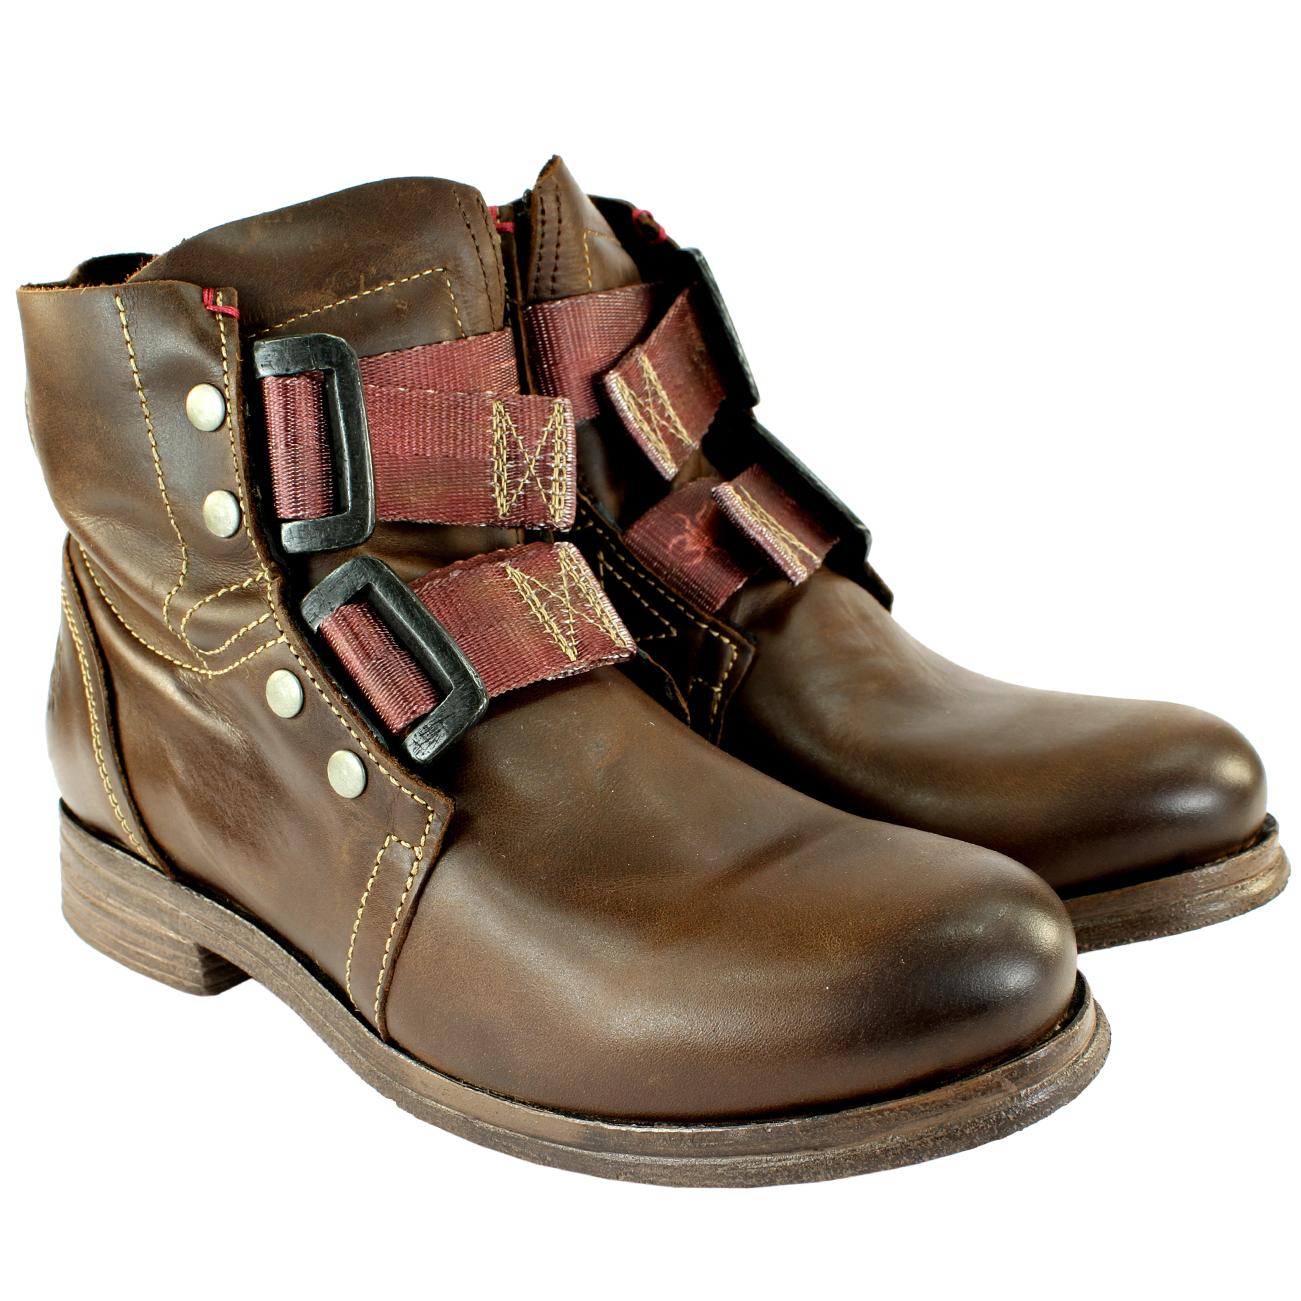 Mujeres-Fly-Londonka-Cuero-Motorista-Conducir-Zapatos-Botas-Militares-36-41